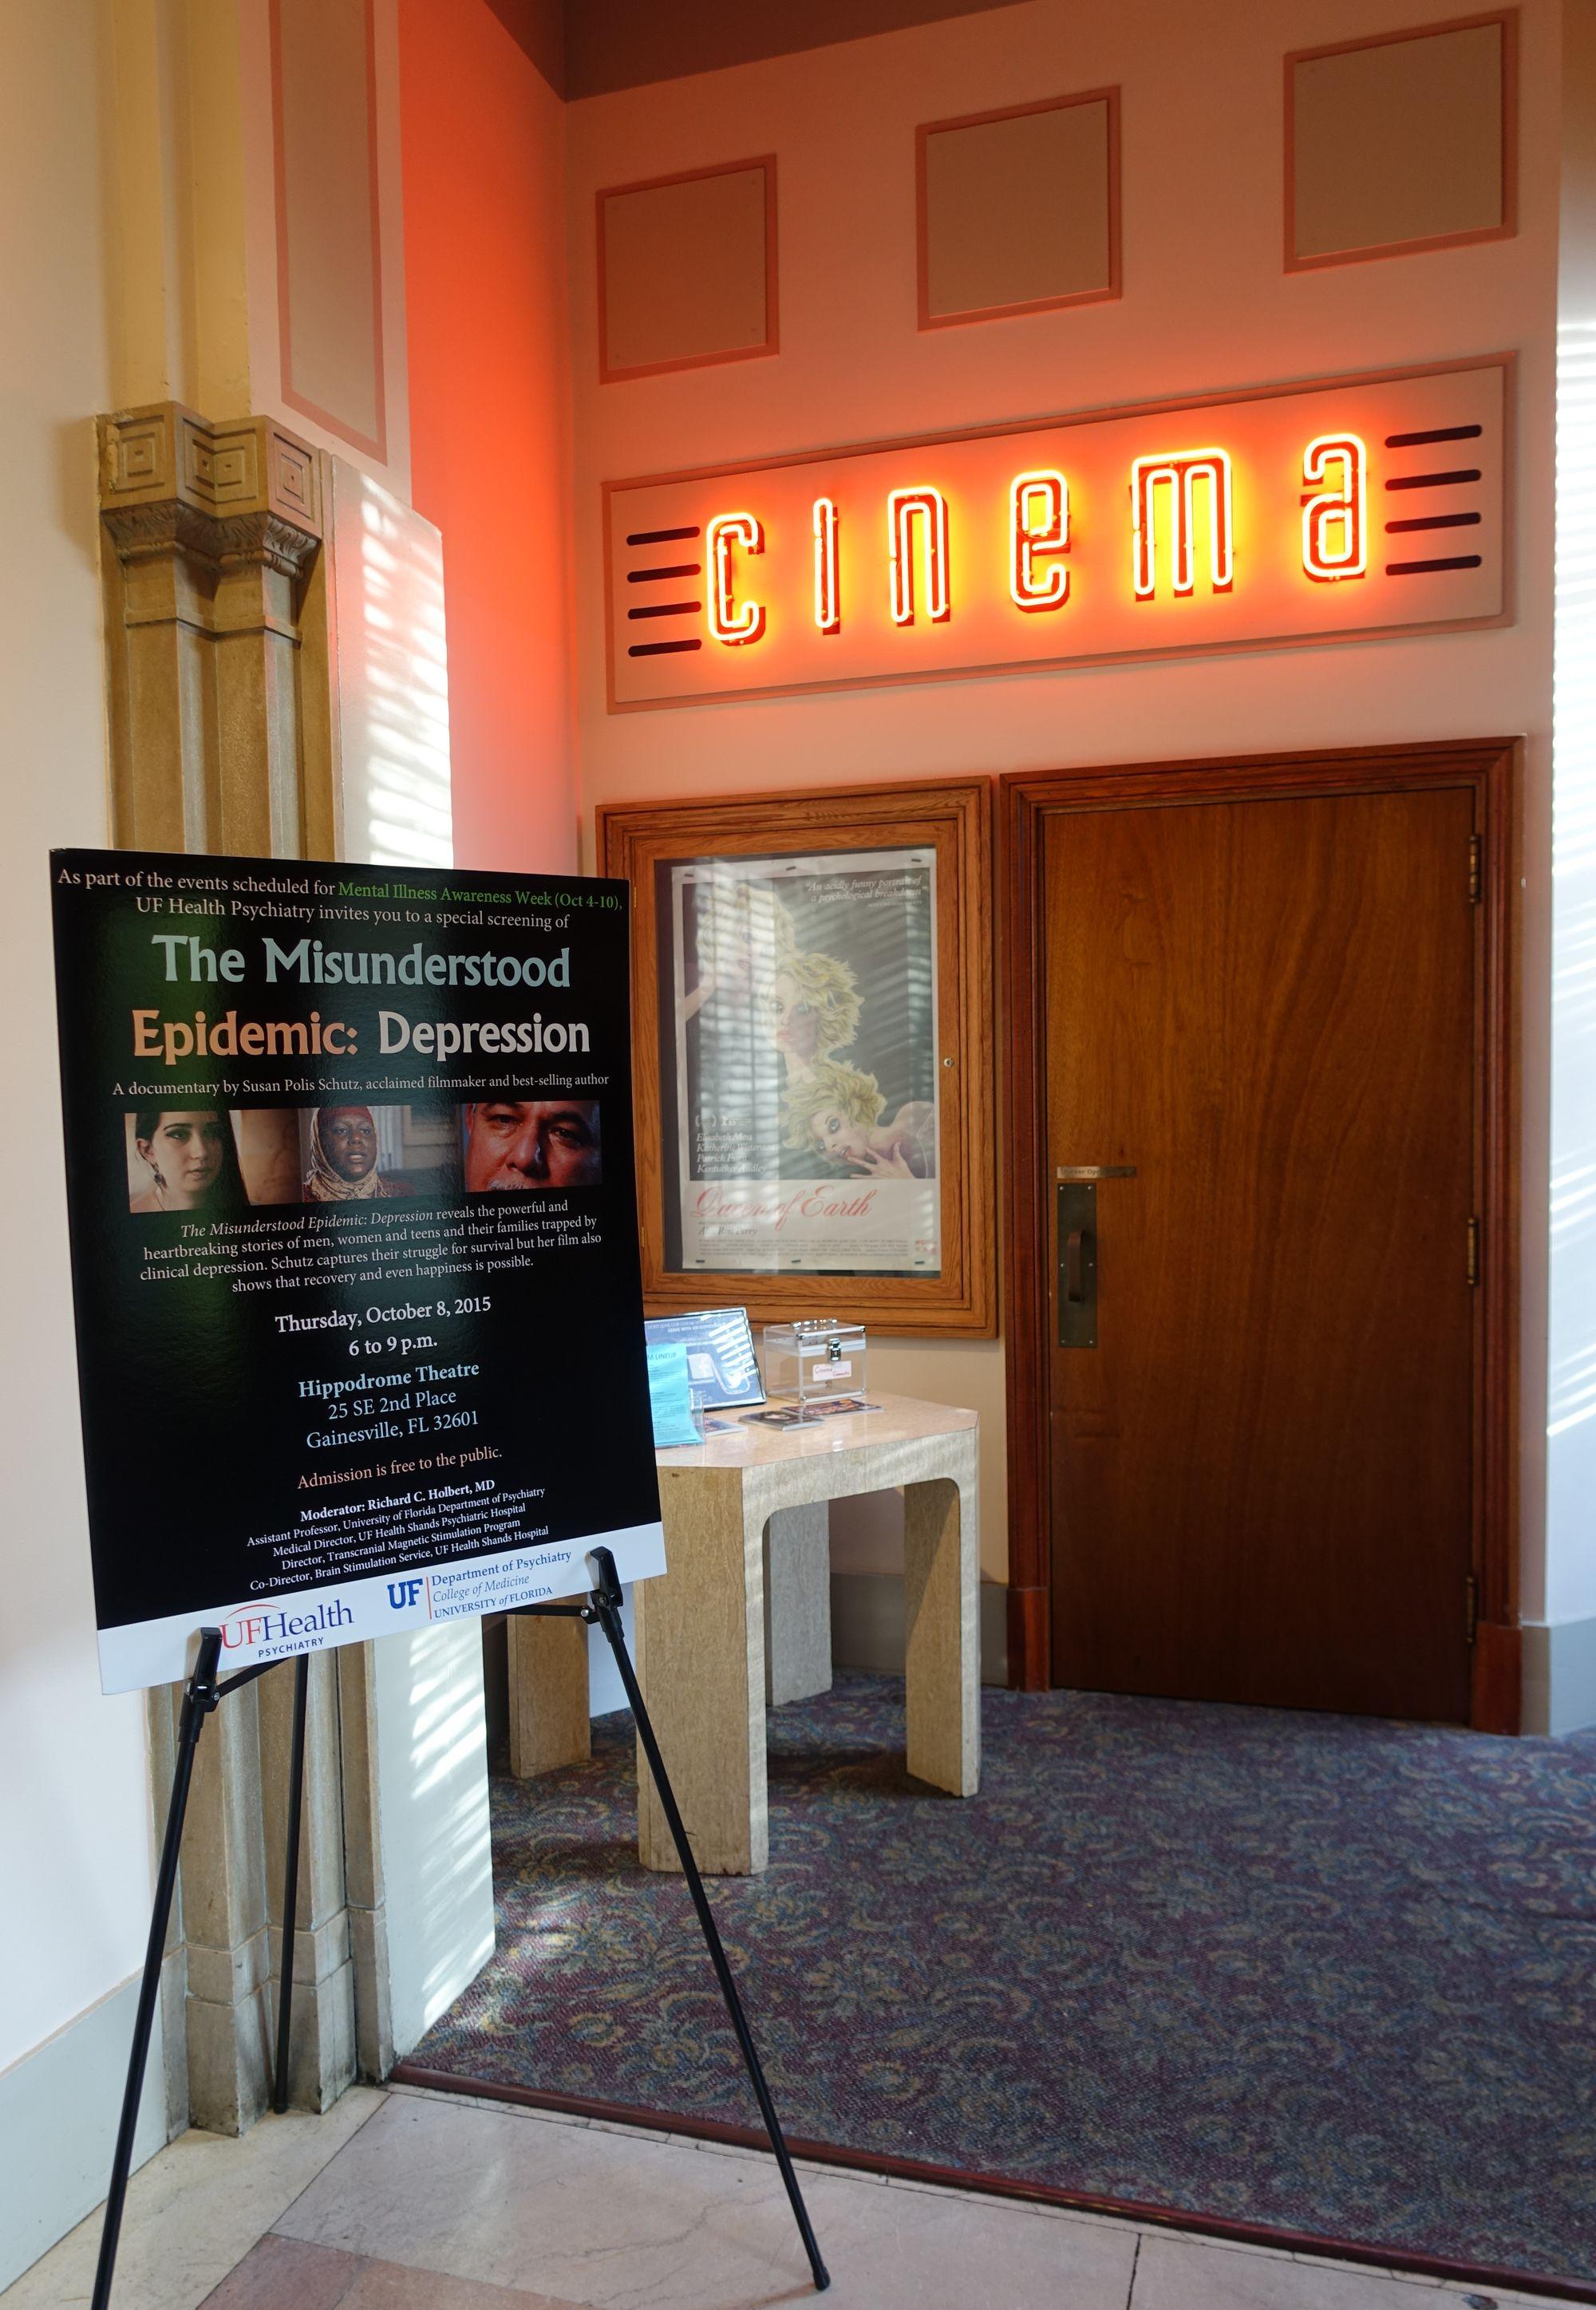 Depression documentary screening at Hippodrome part of